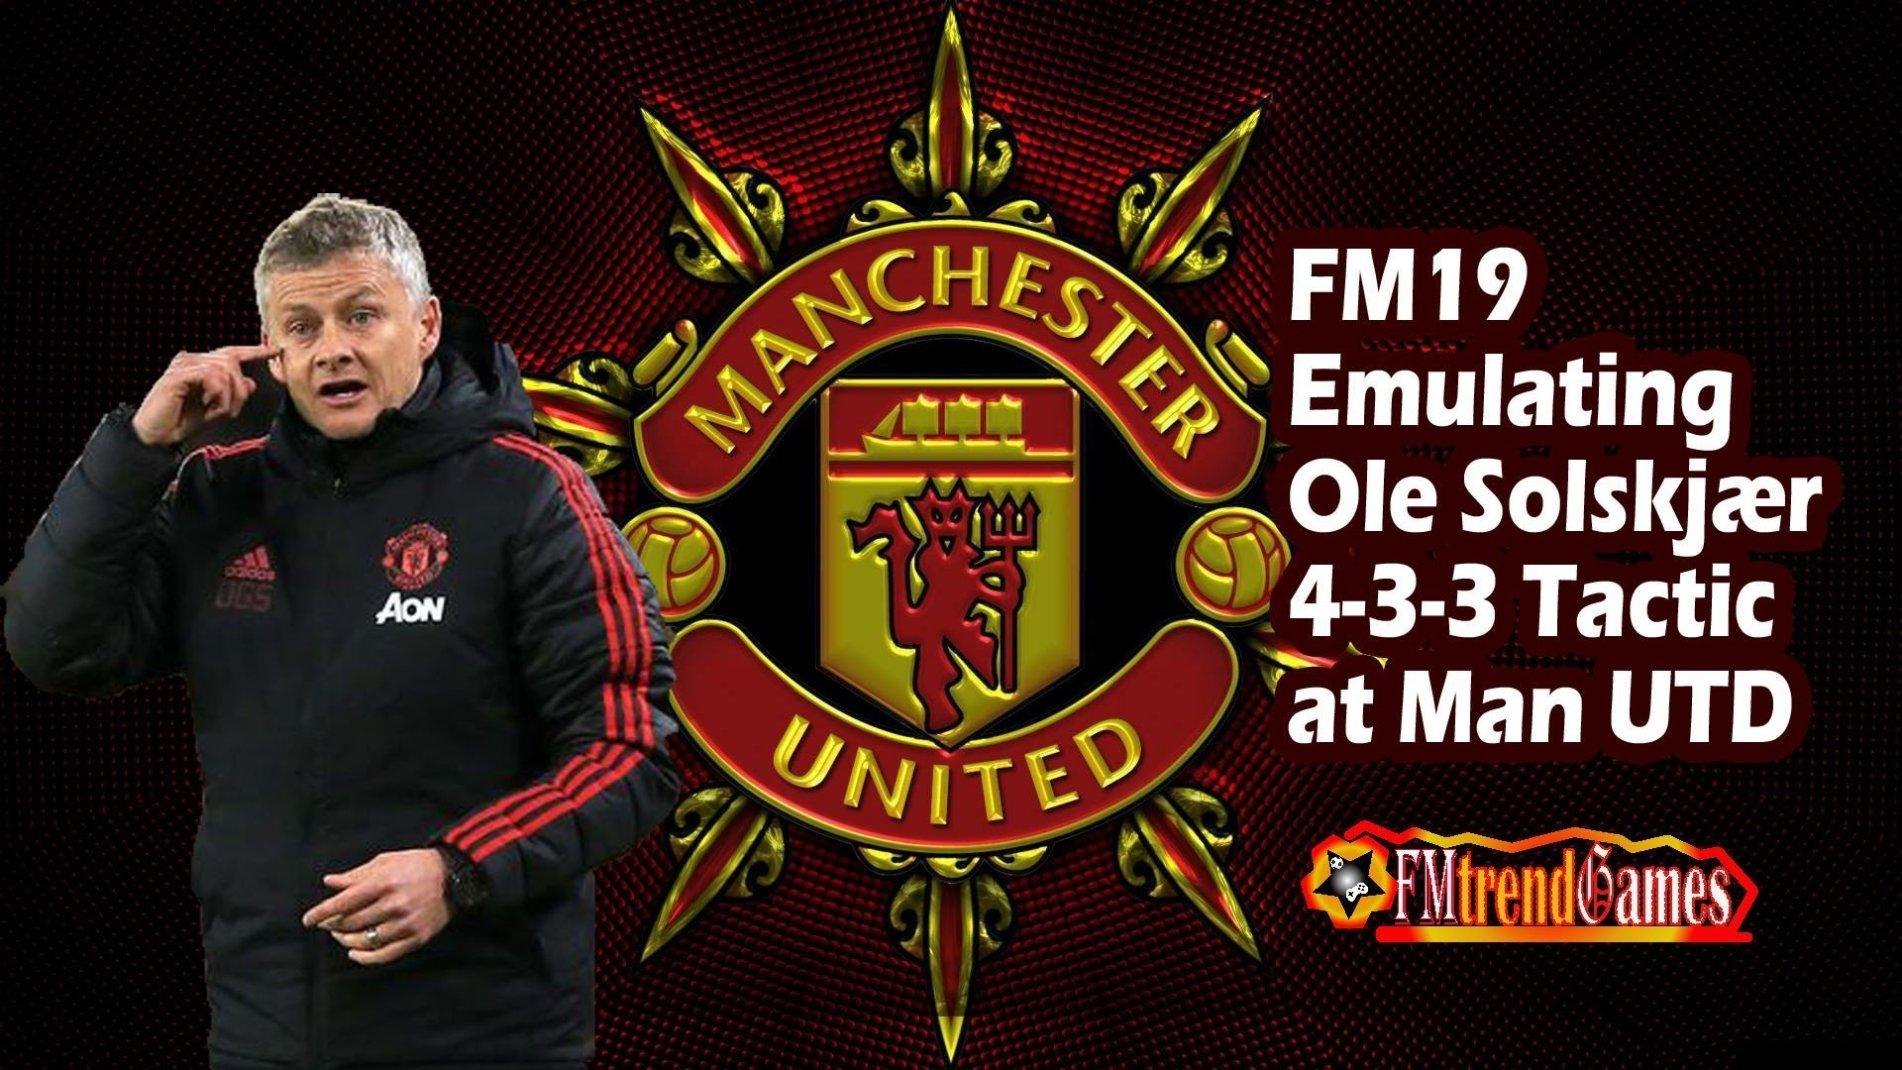 FM19: Ole Solskjær's 4-3-3 Tactic at Man United   FMtrendGames